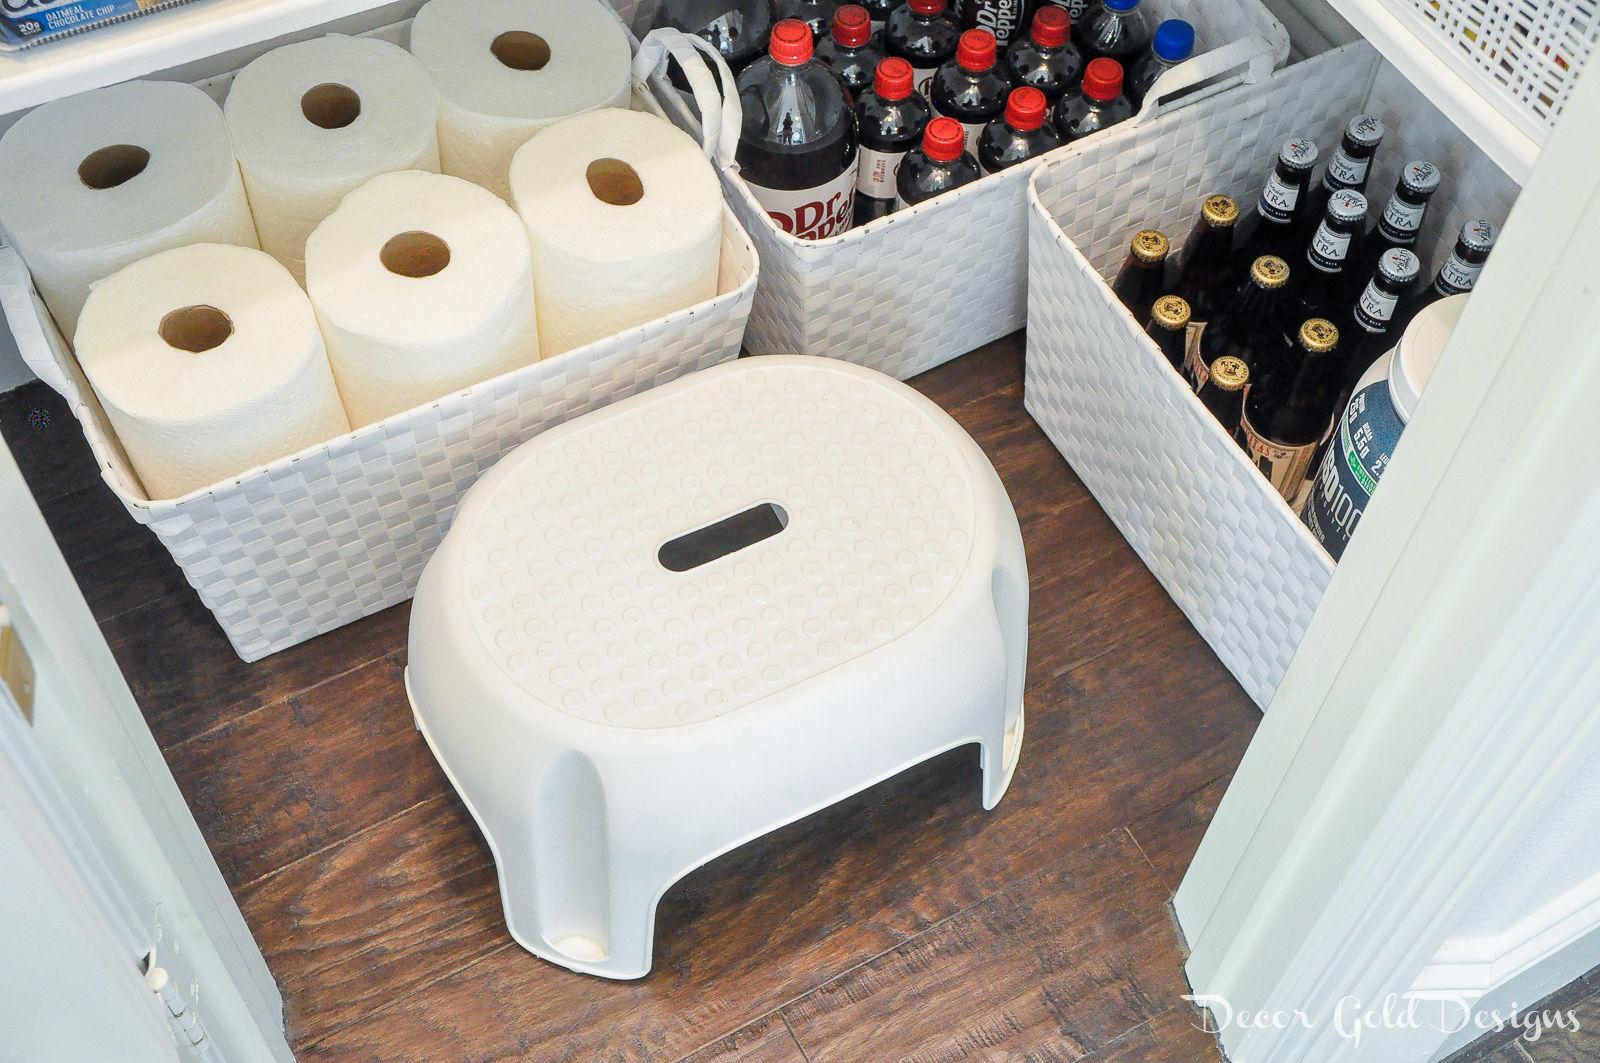 Organized pantry floor baskets